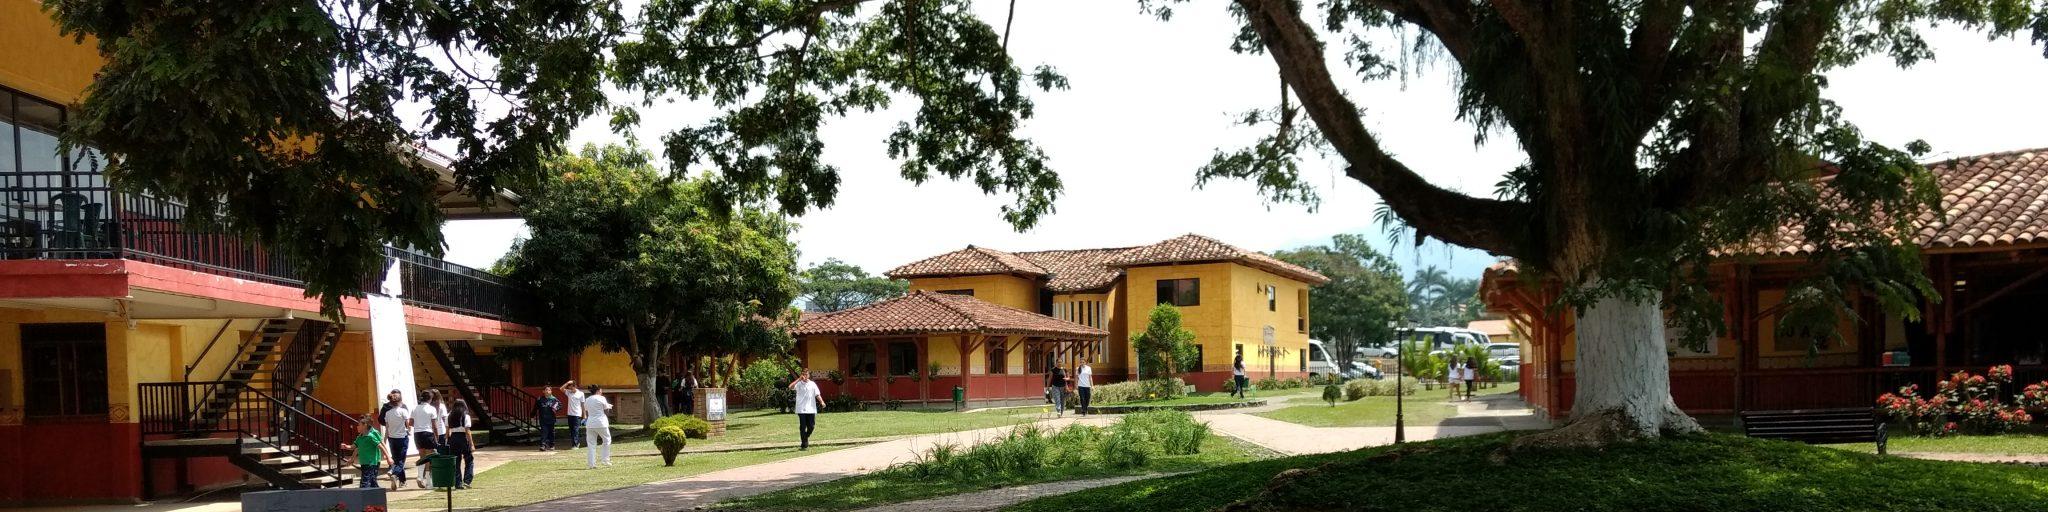 Liceo Pino Verde